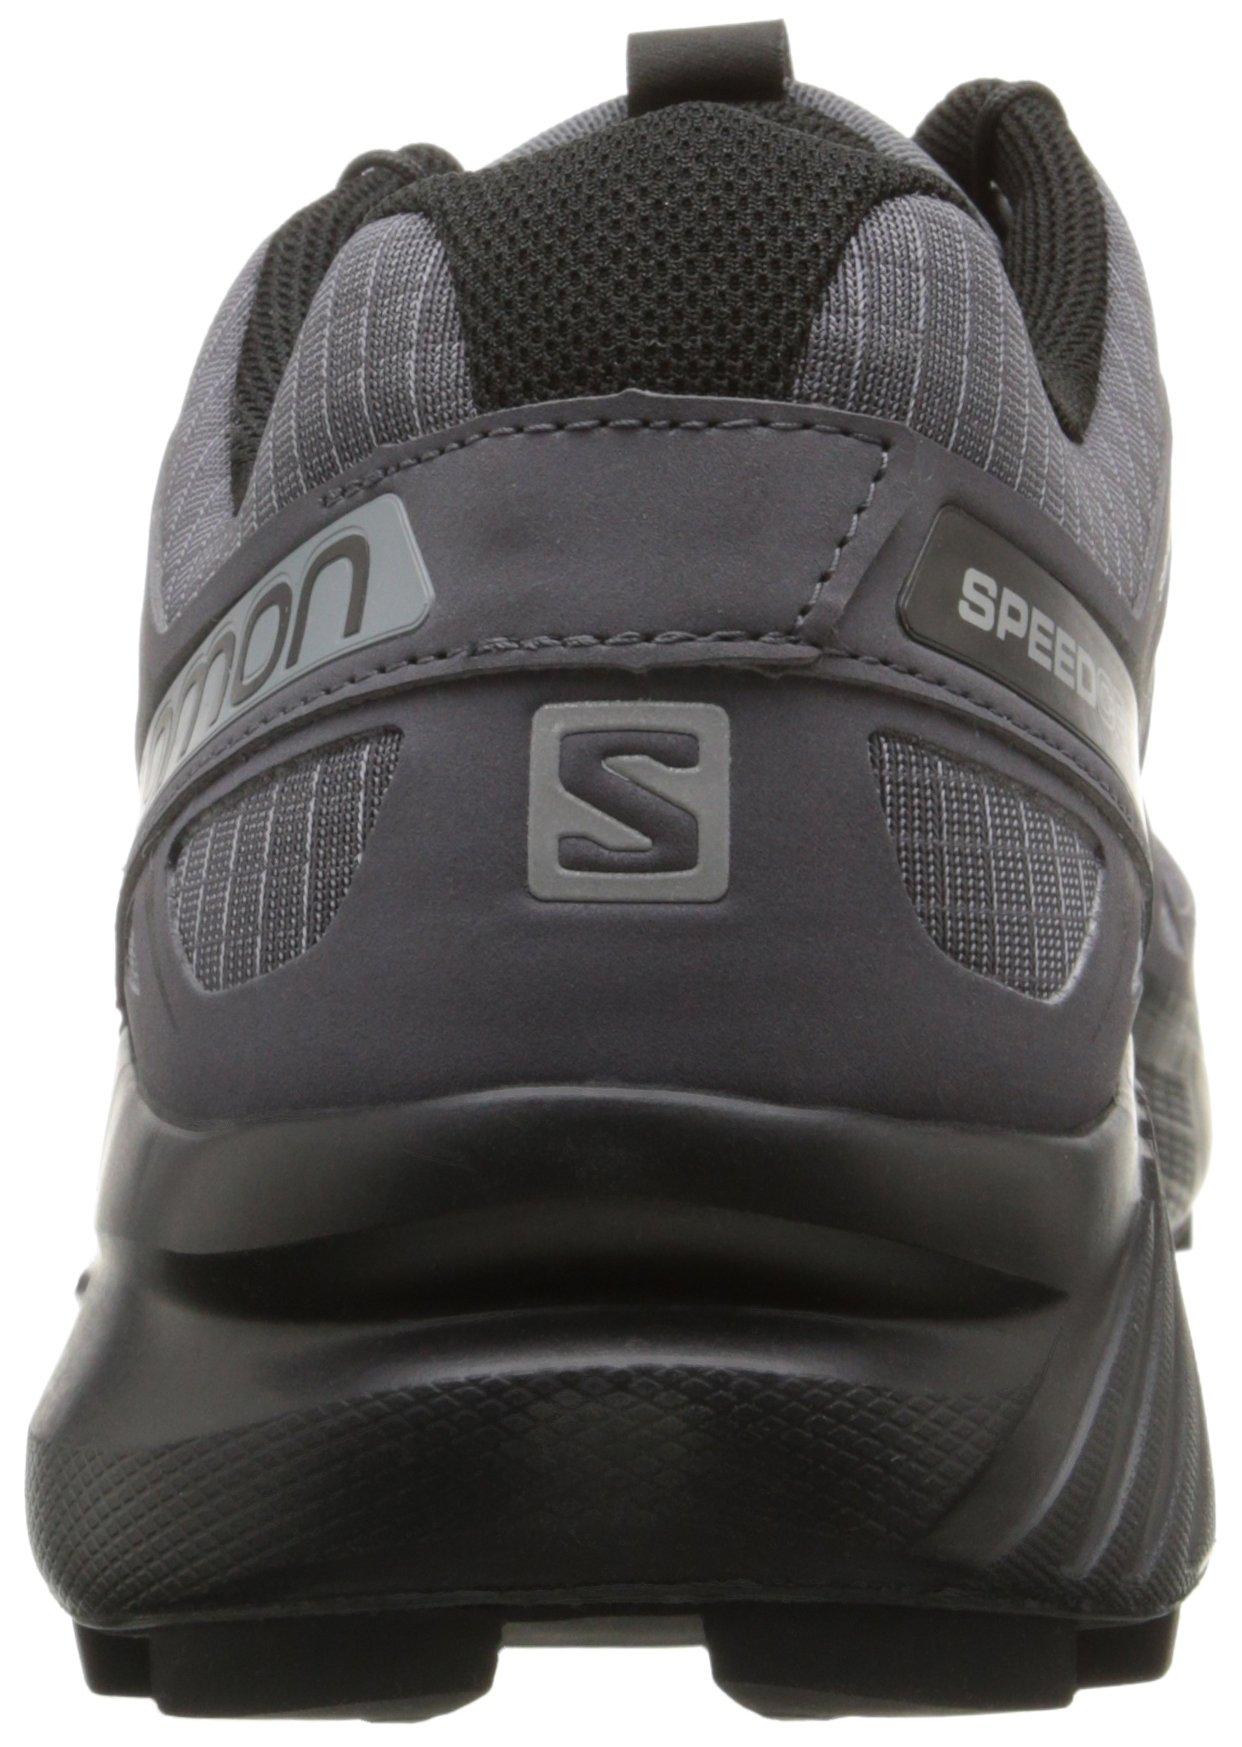 Salomon Men's Speedcross 4 Trail Runner, Dark Cloud, 7 M US by Salomon (Image #3)